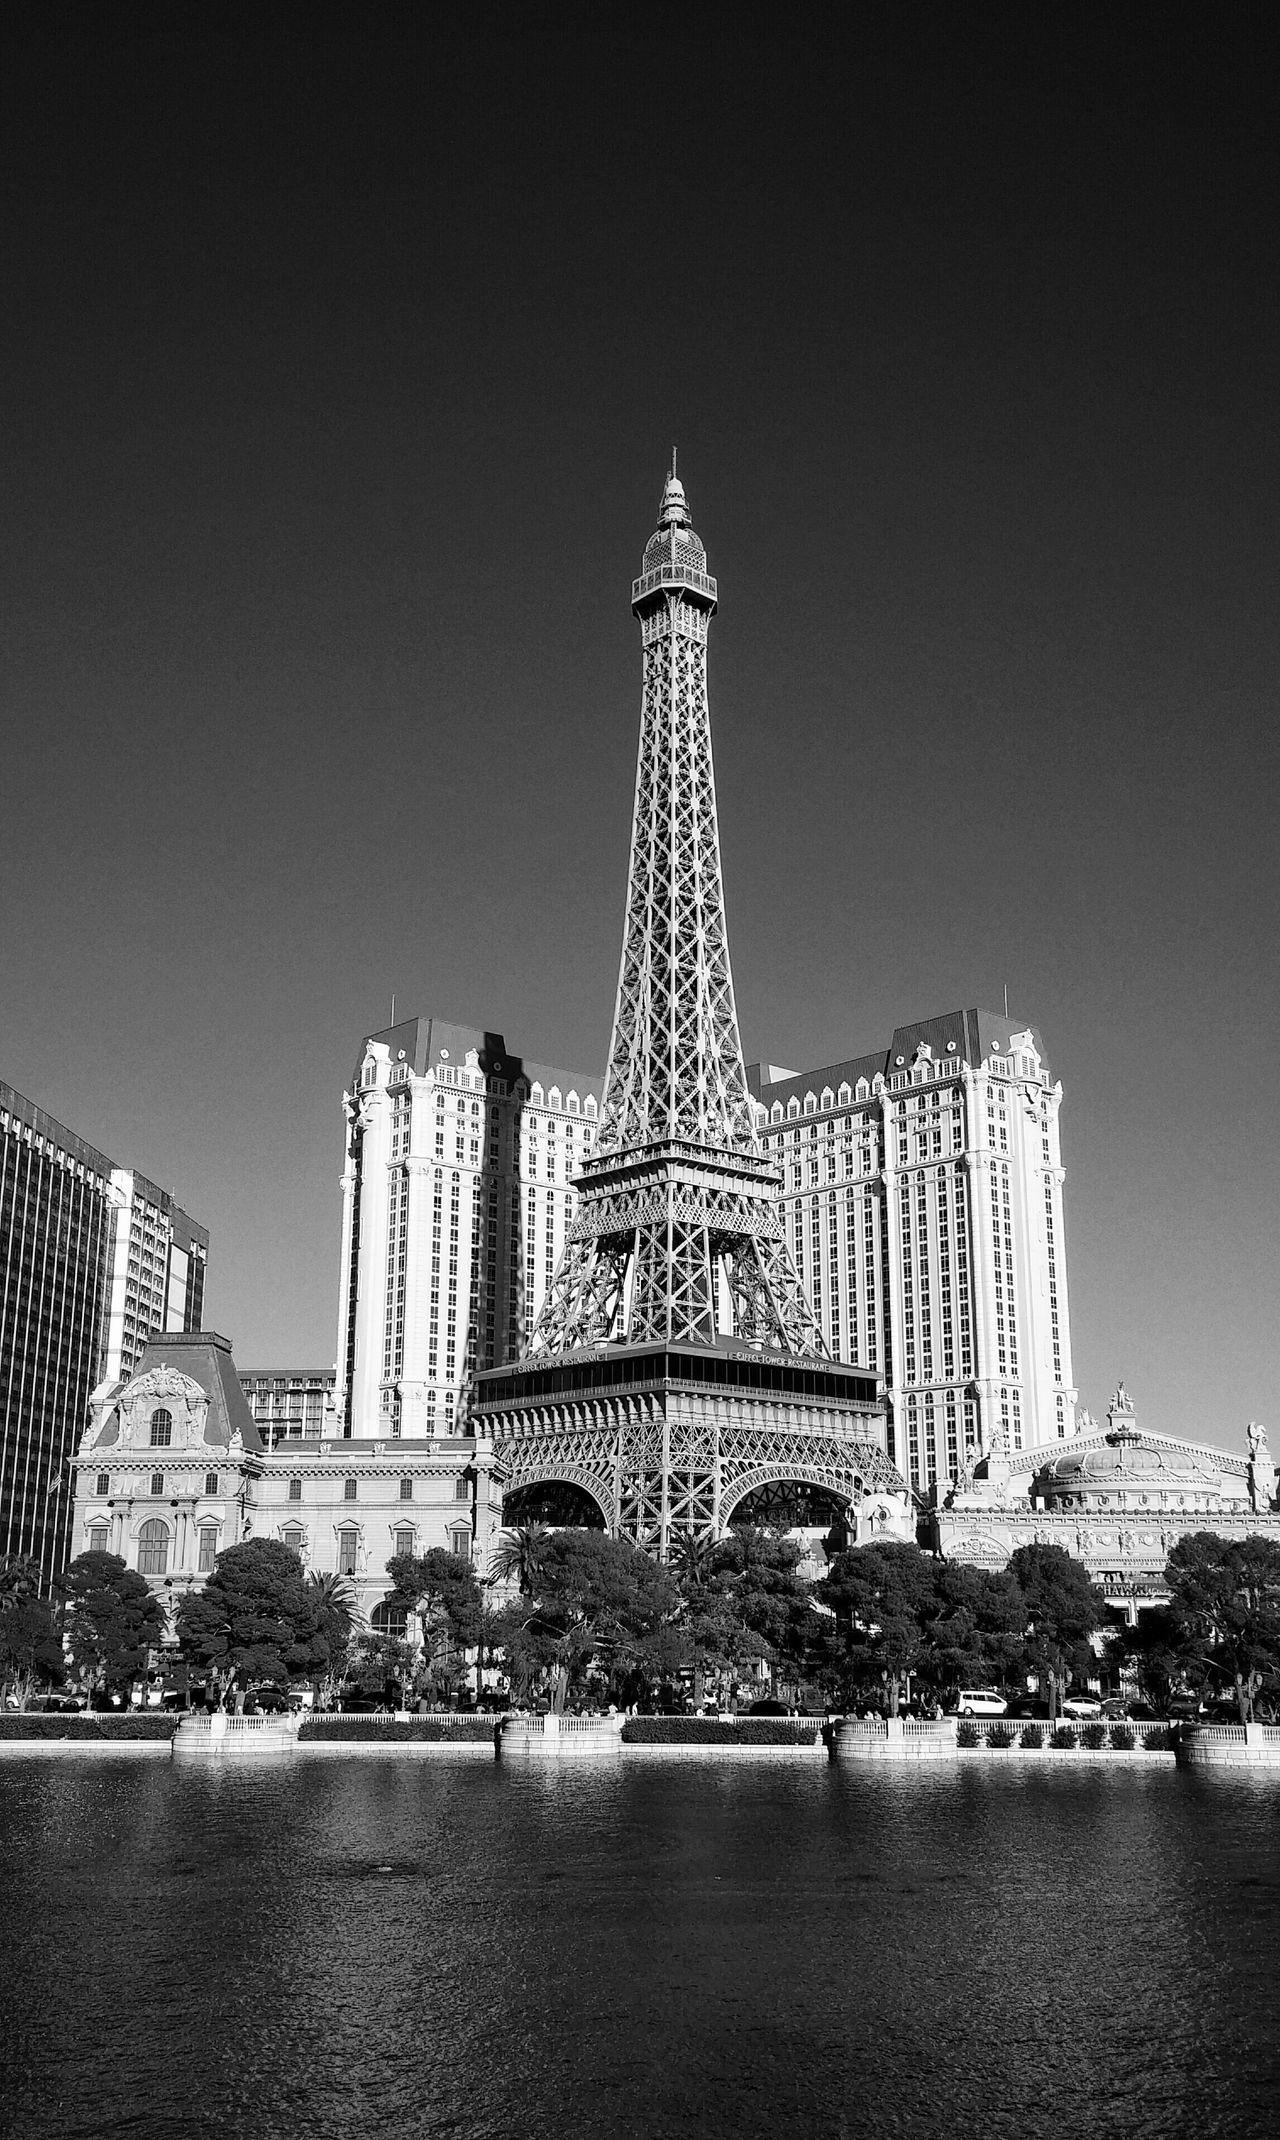 Replica Eiffel Tower Las Vegas Blackandwhite The Architect - 2015 EyeEm Awards Black And White Photography Streetphoto_bw Architecture_bw Street Photography Replica  Travel Photography